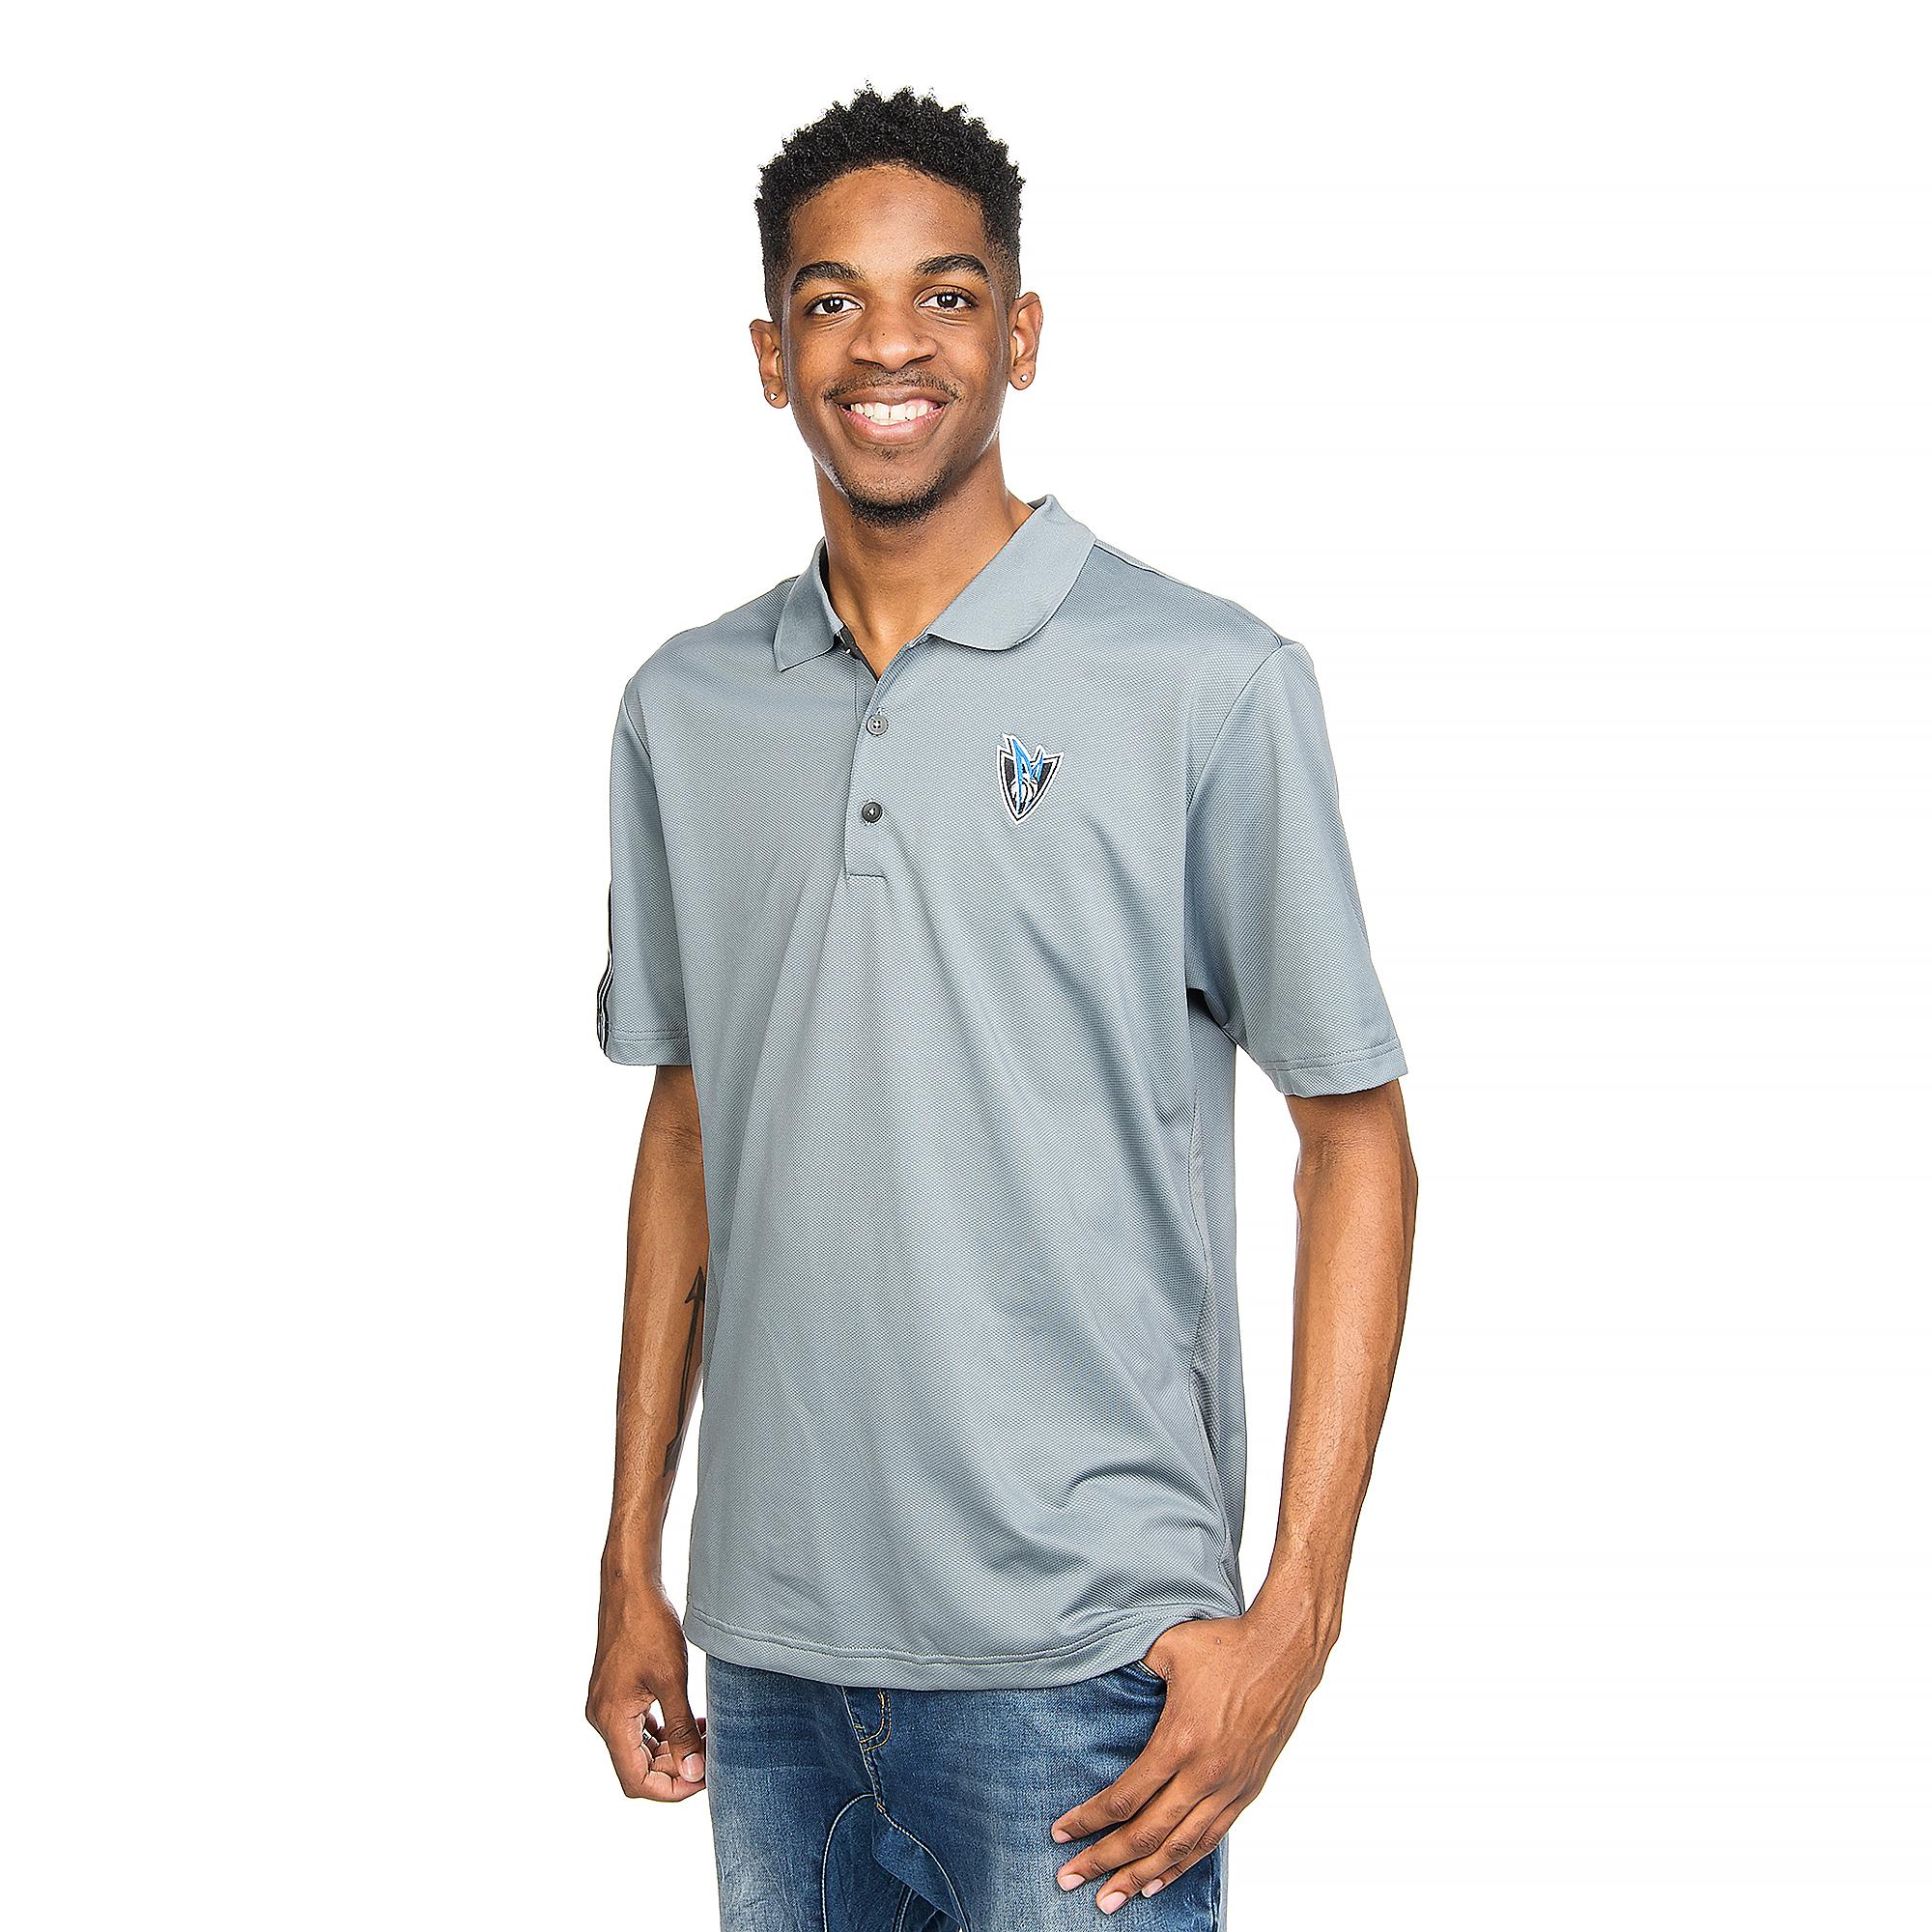 Dallas Mavericks Adidas Golf 3 Stripe Polo